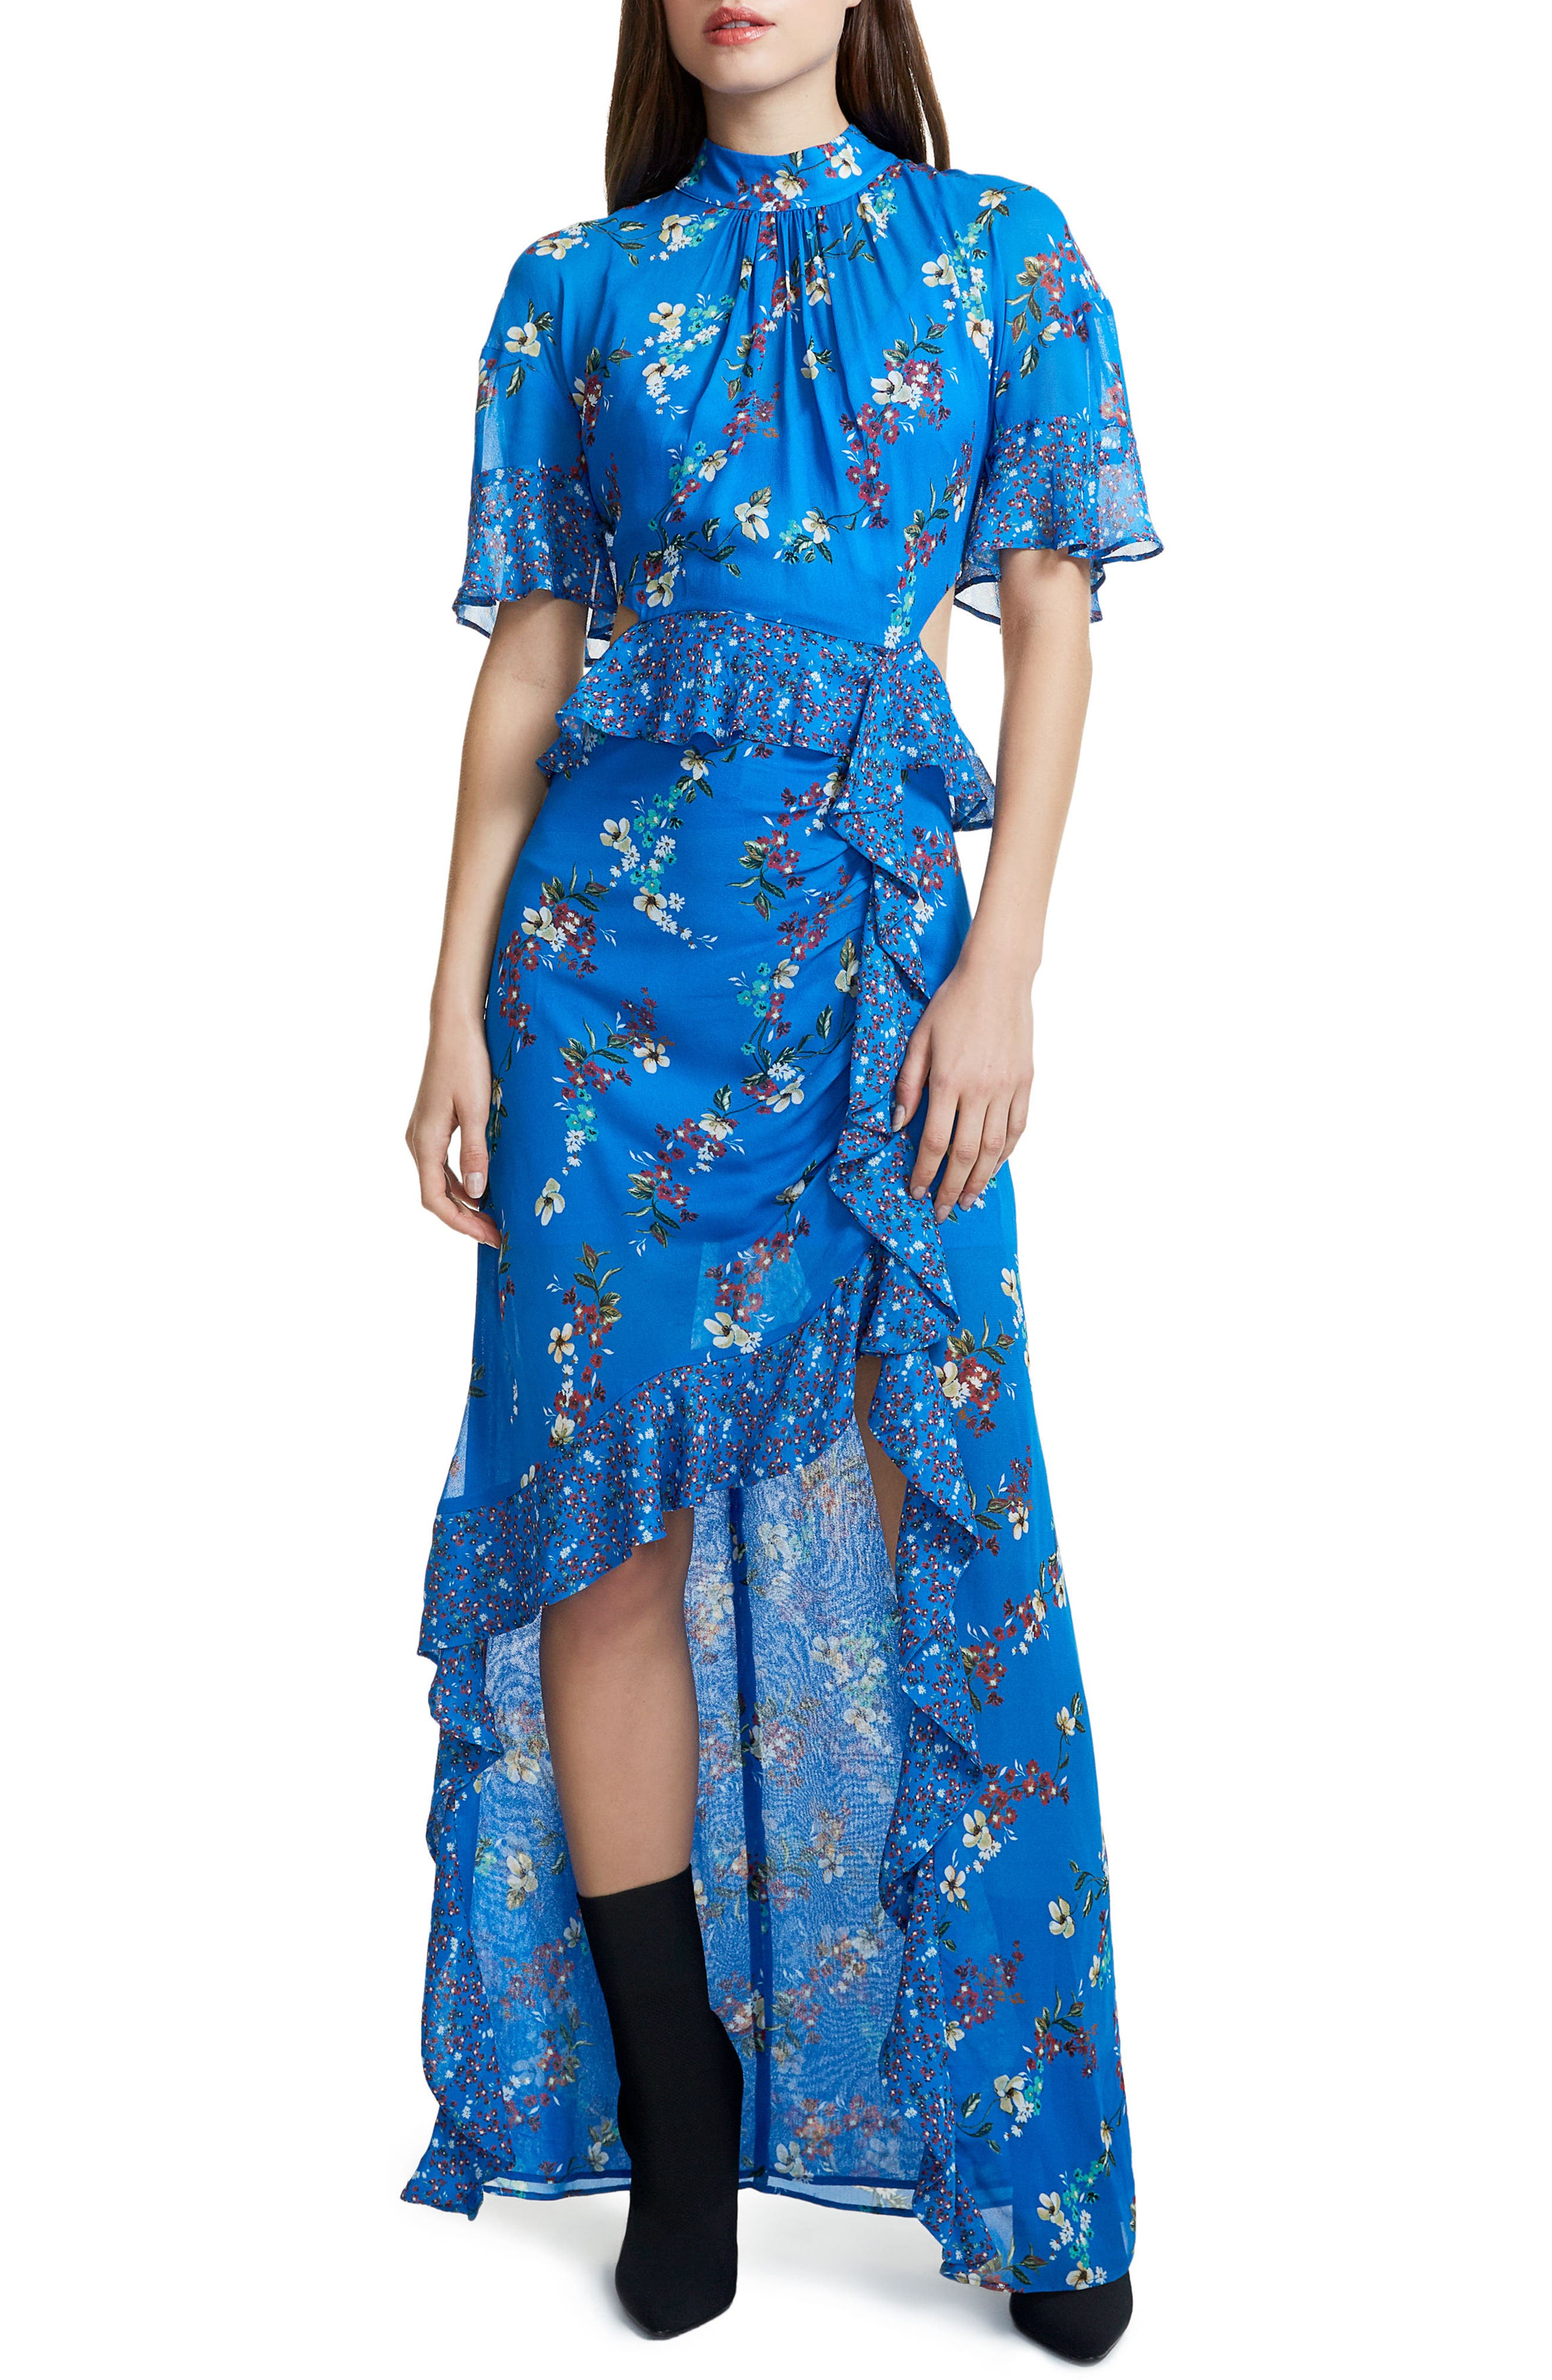 Melsa Cutout Maxi Dress,                             Main thumbnail 1, color,